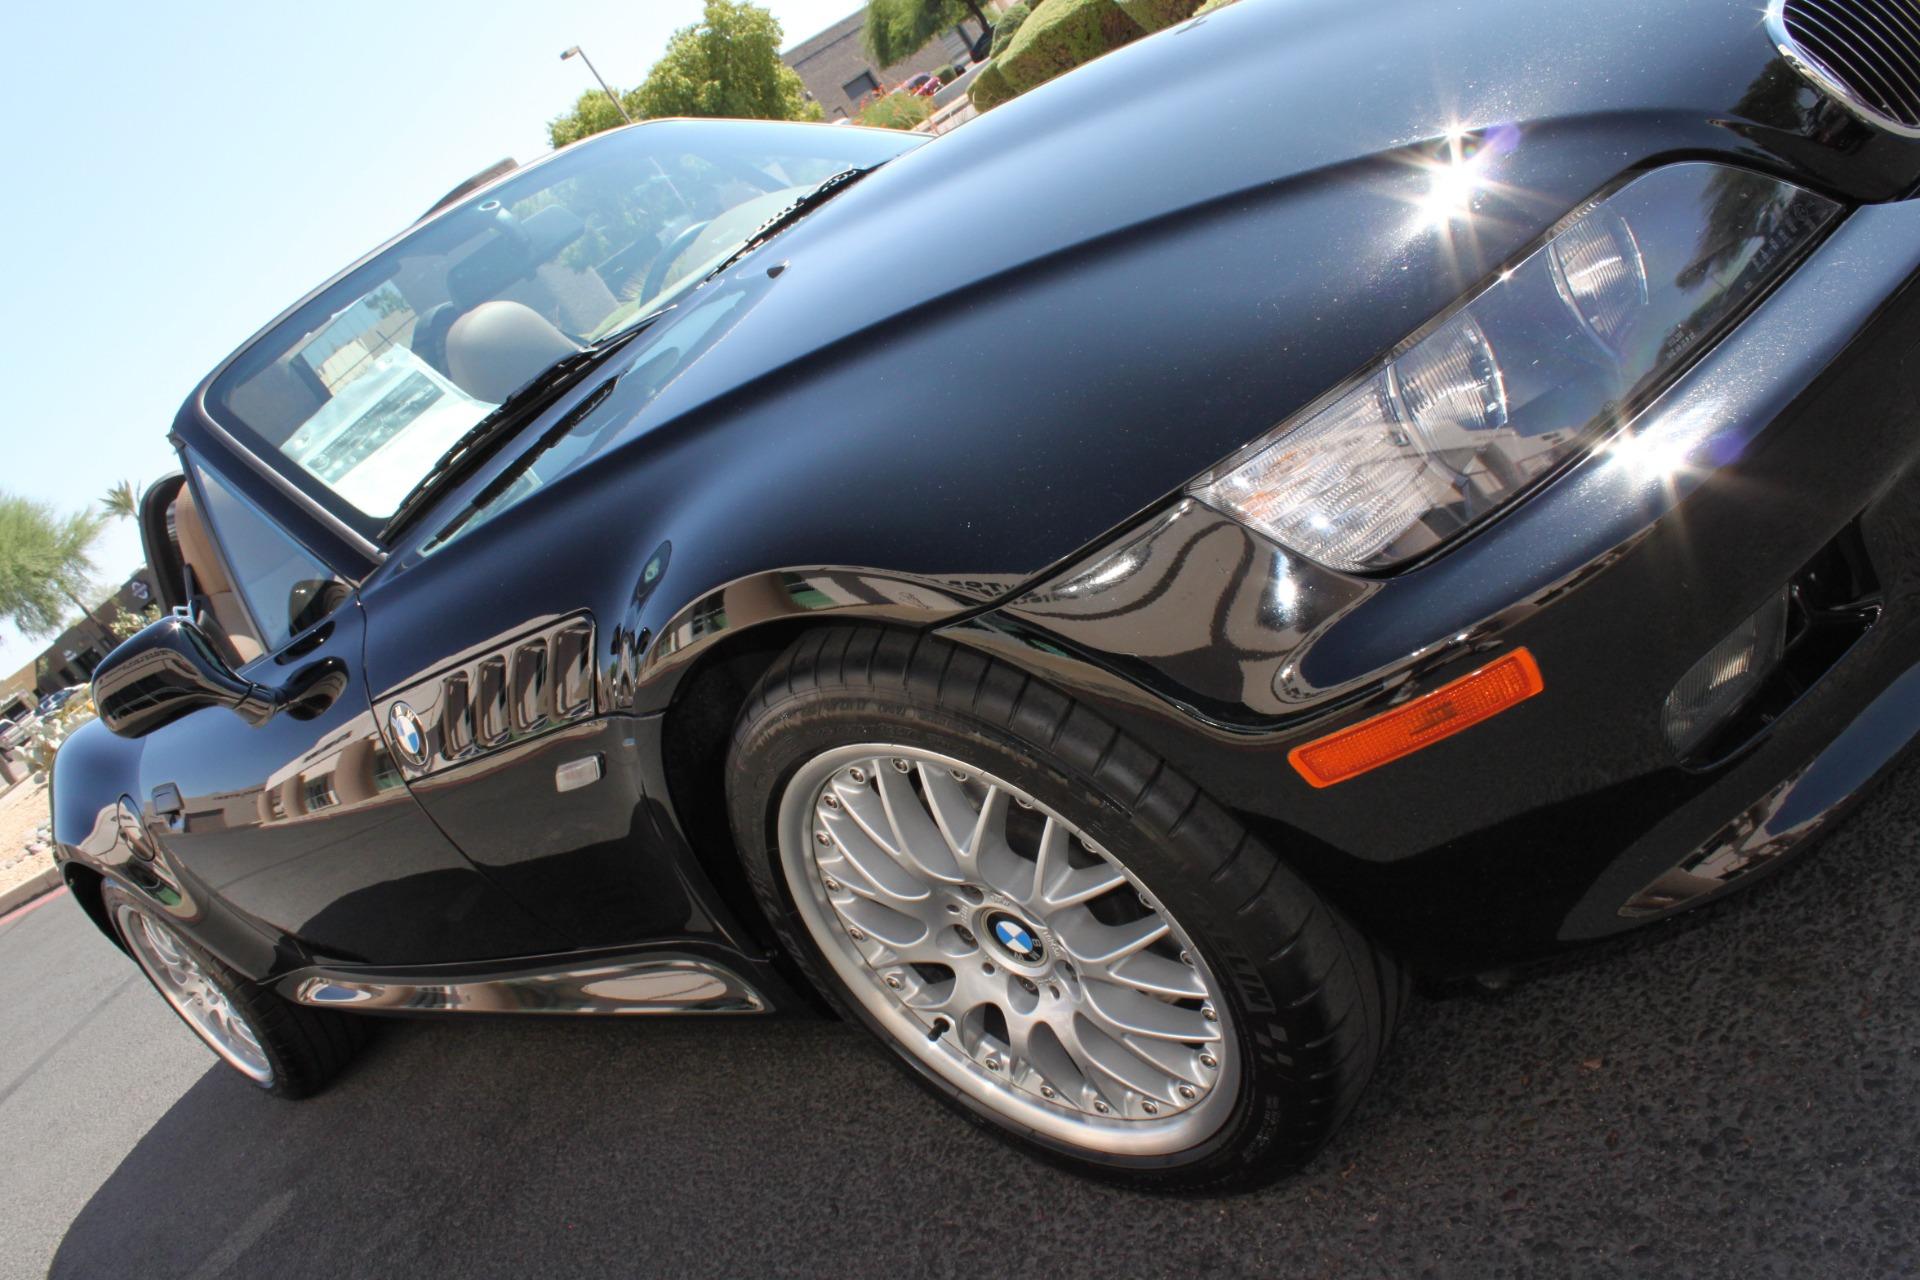 Used-2001-BMW-Z3-30i-Roadster-Chevrolet